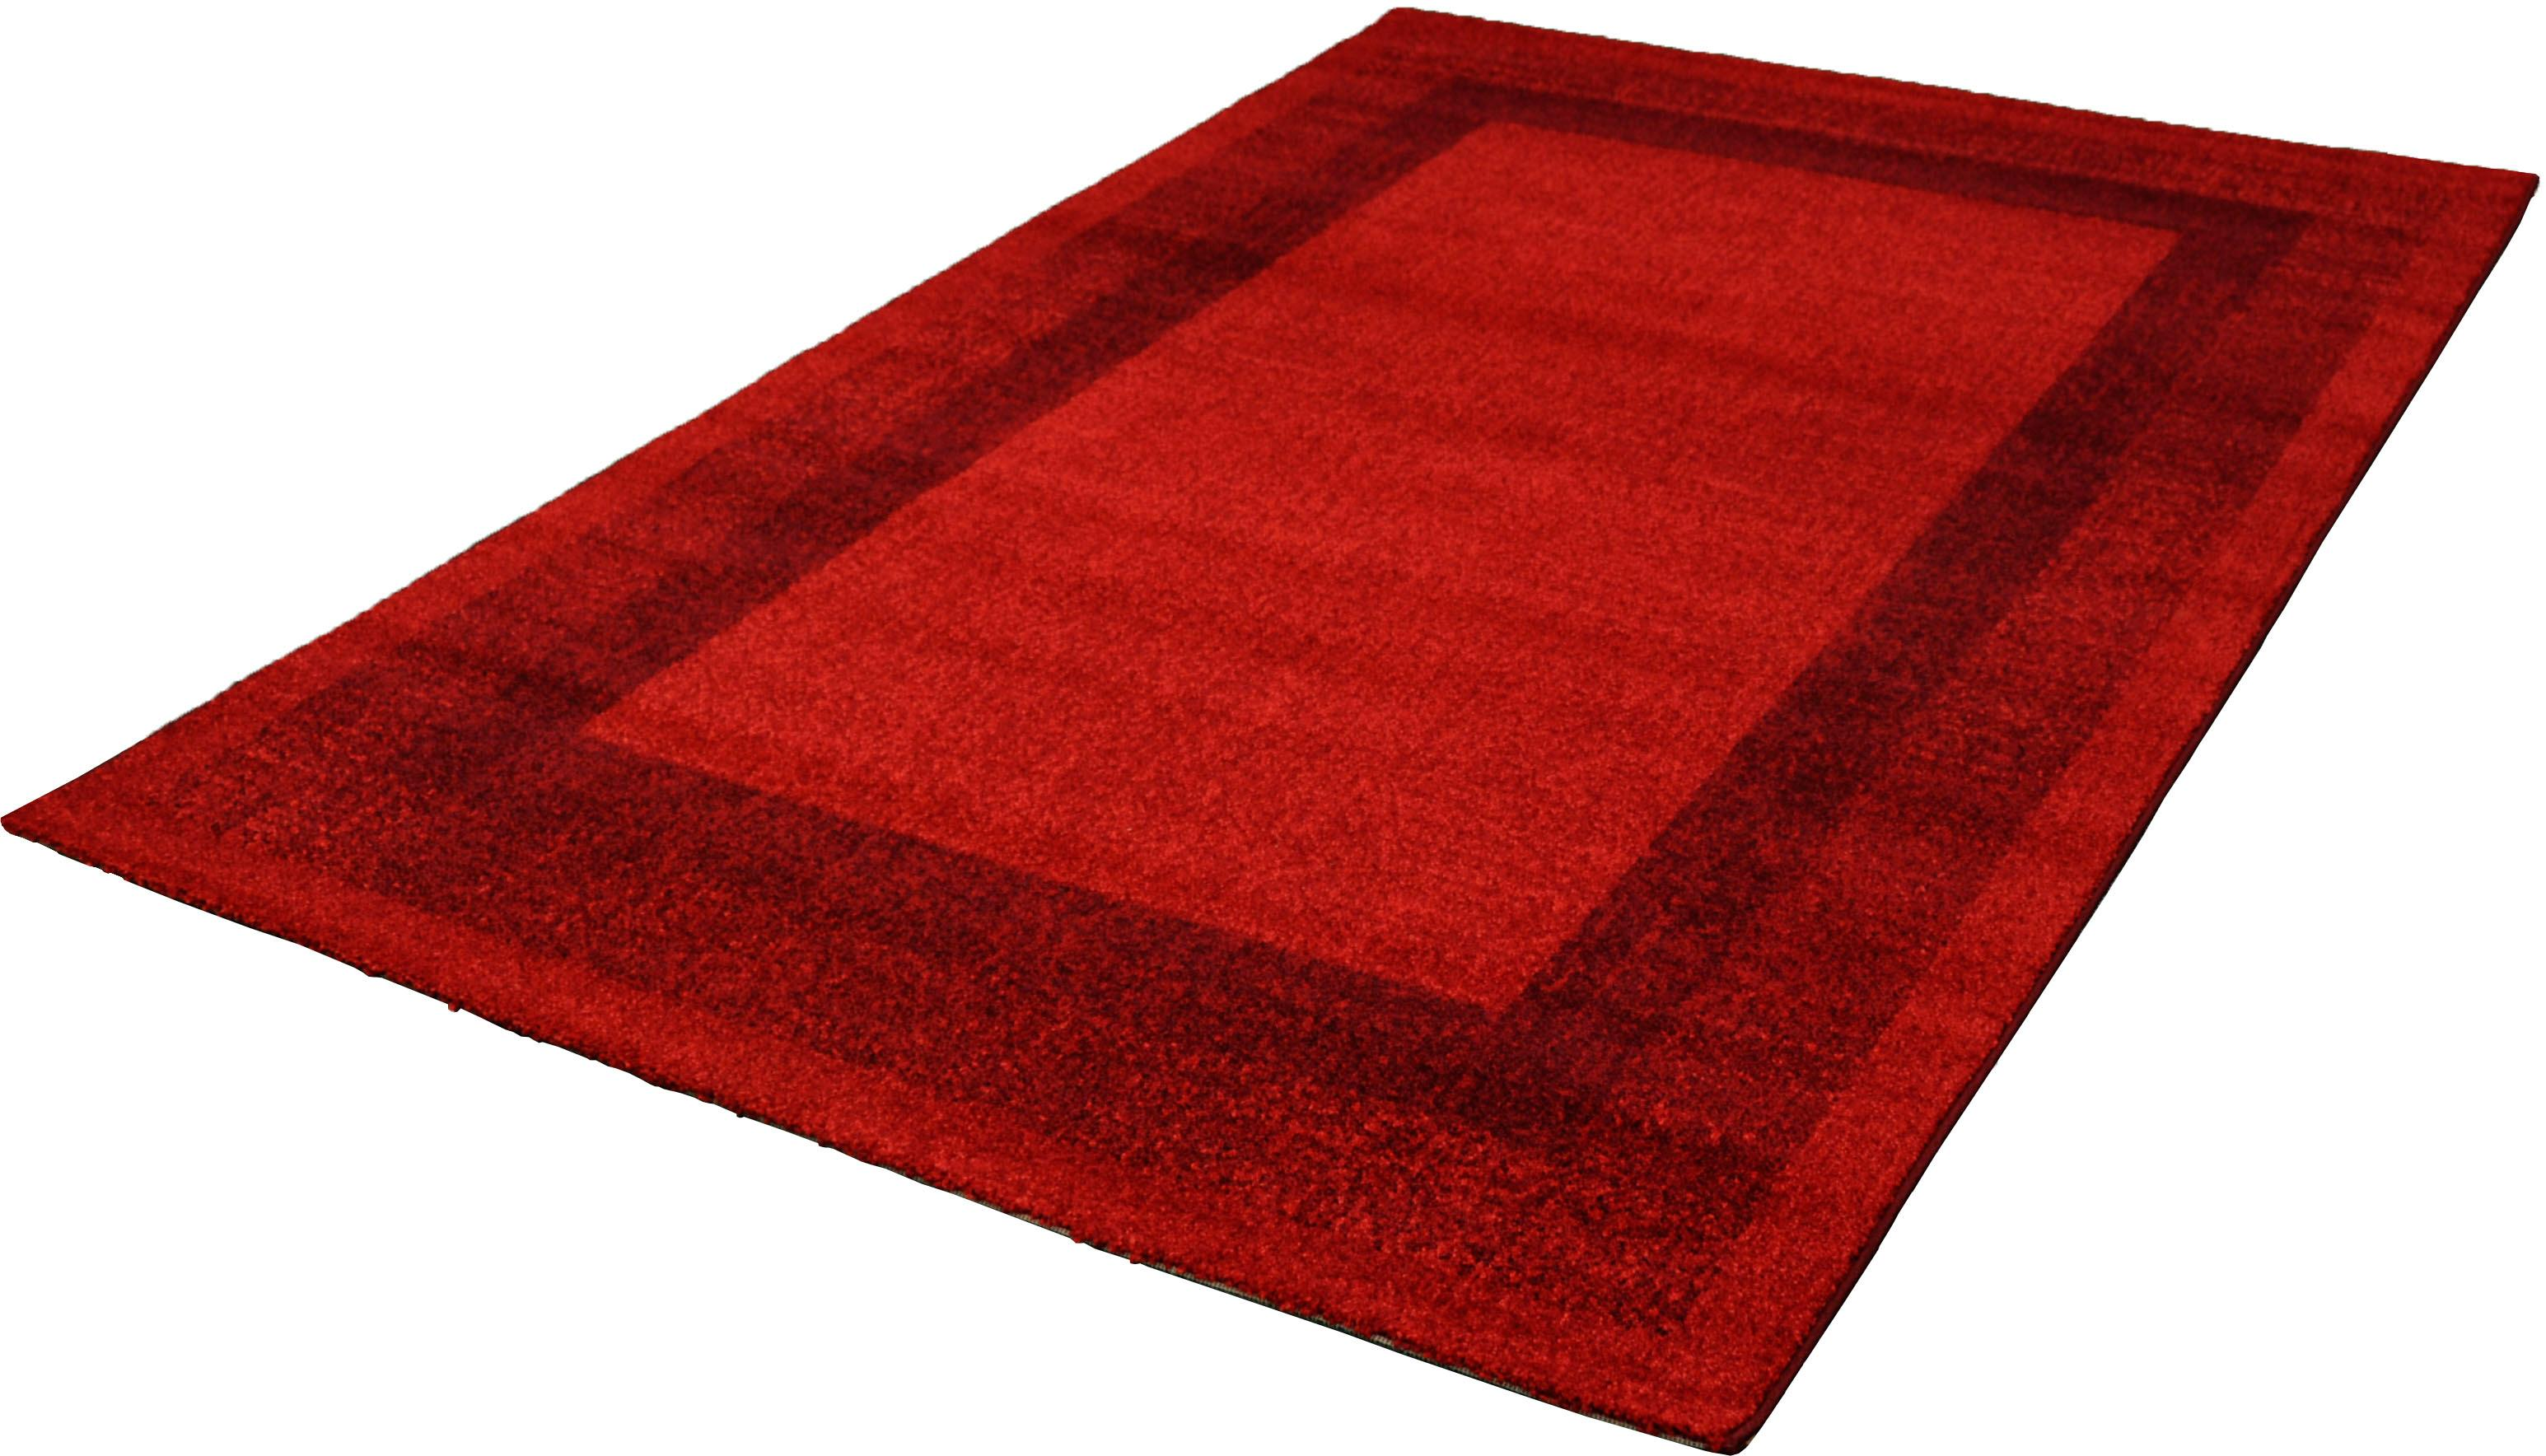 Teppich Chester 1215 merinos rechteckig Höhe 9 mm maschinell gewebt